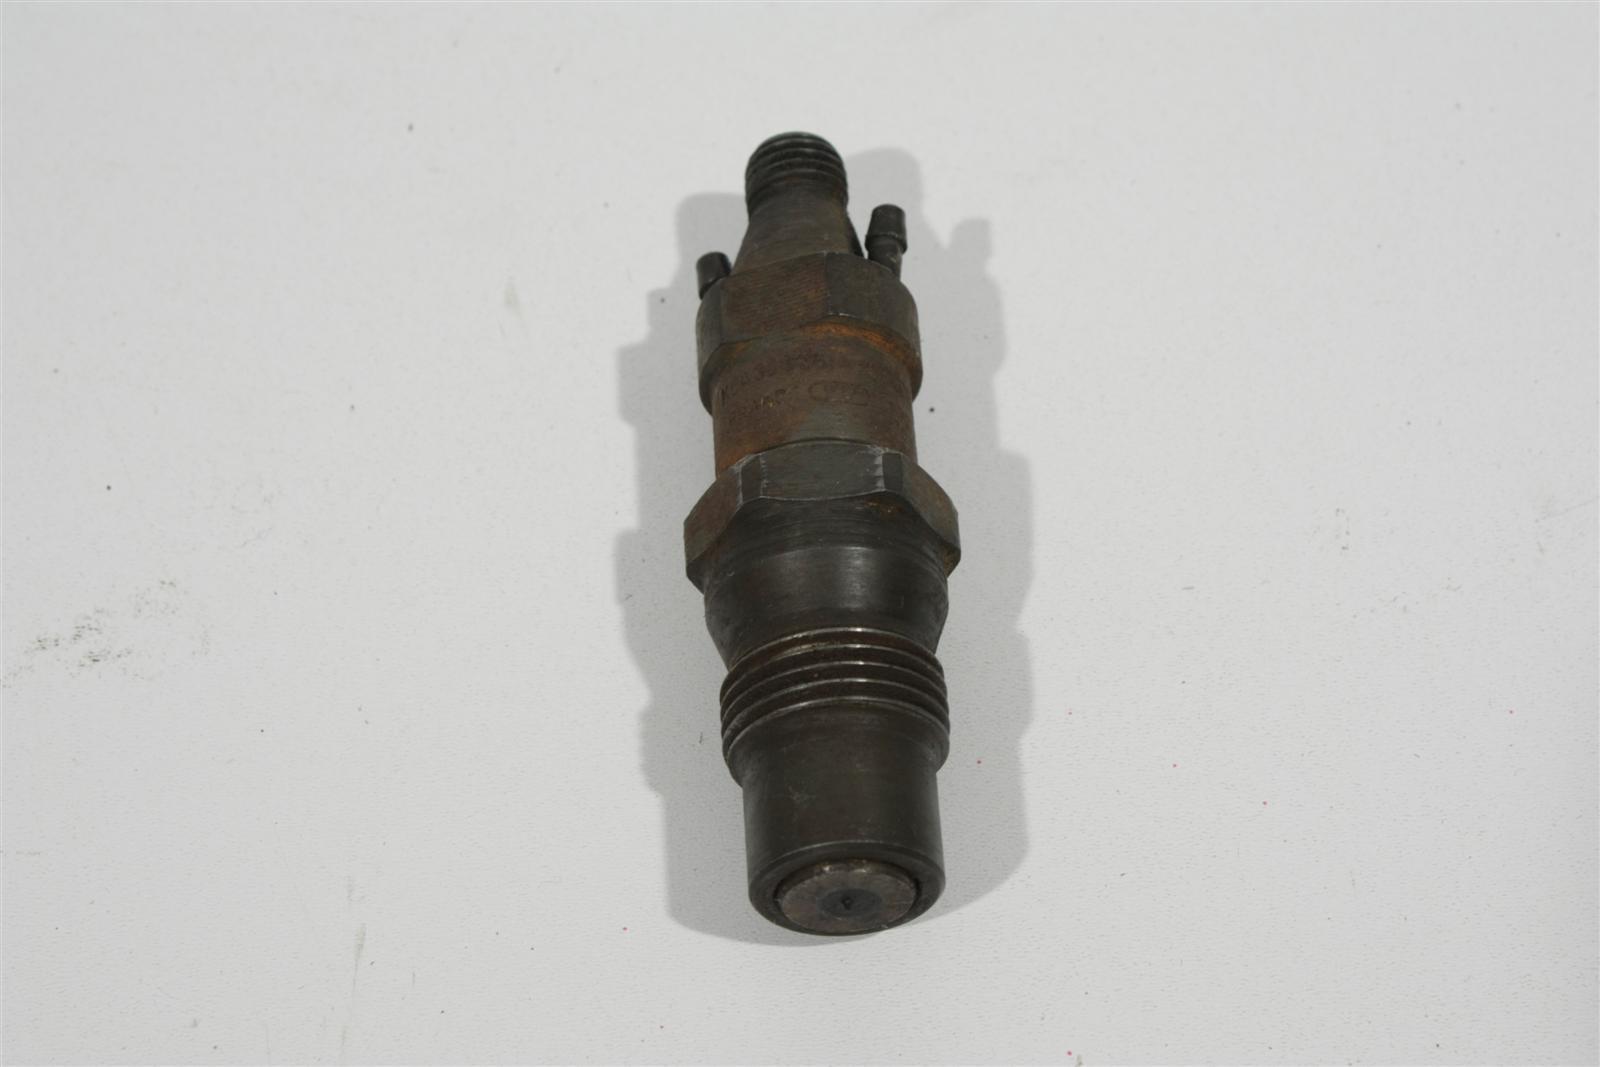 VW Golf/Jetta Diesel 1.6l 60PS 1V Einspritzdüse 068130202DX 068130202D